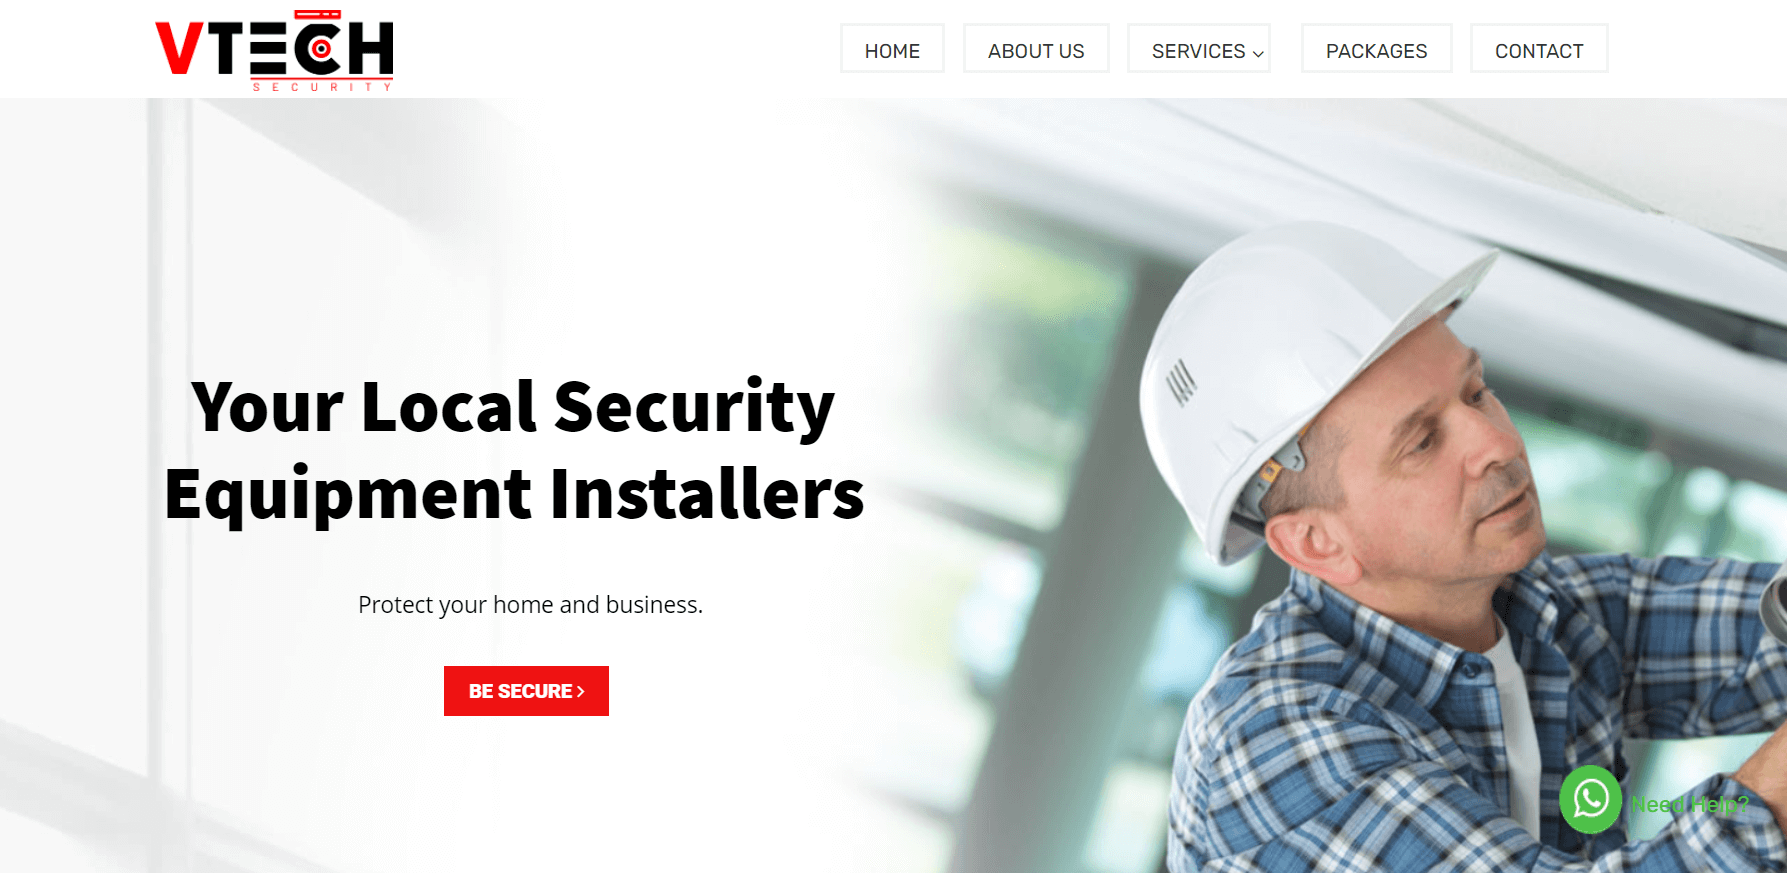 vtech security